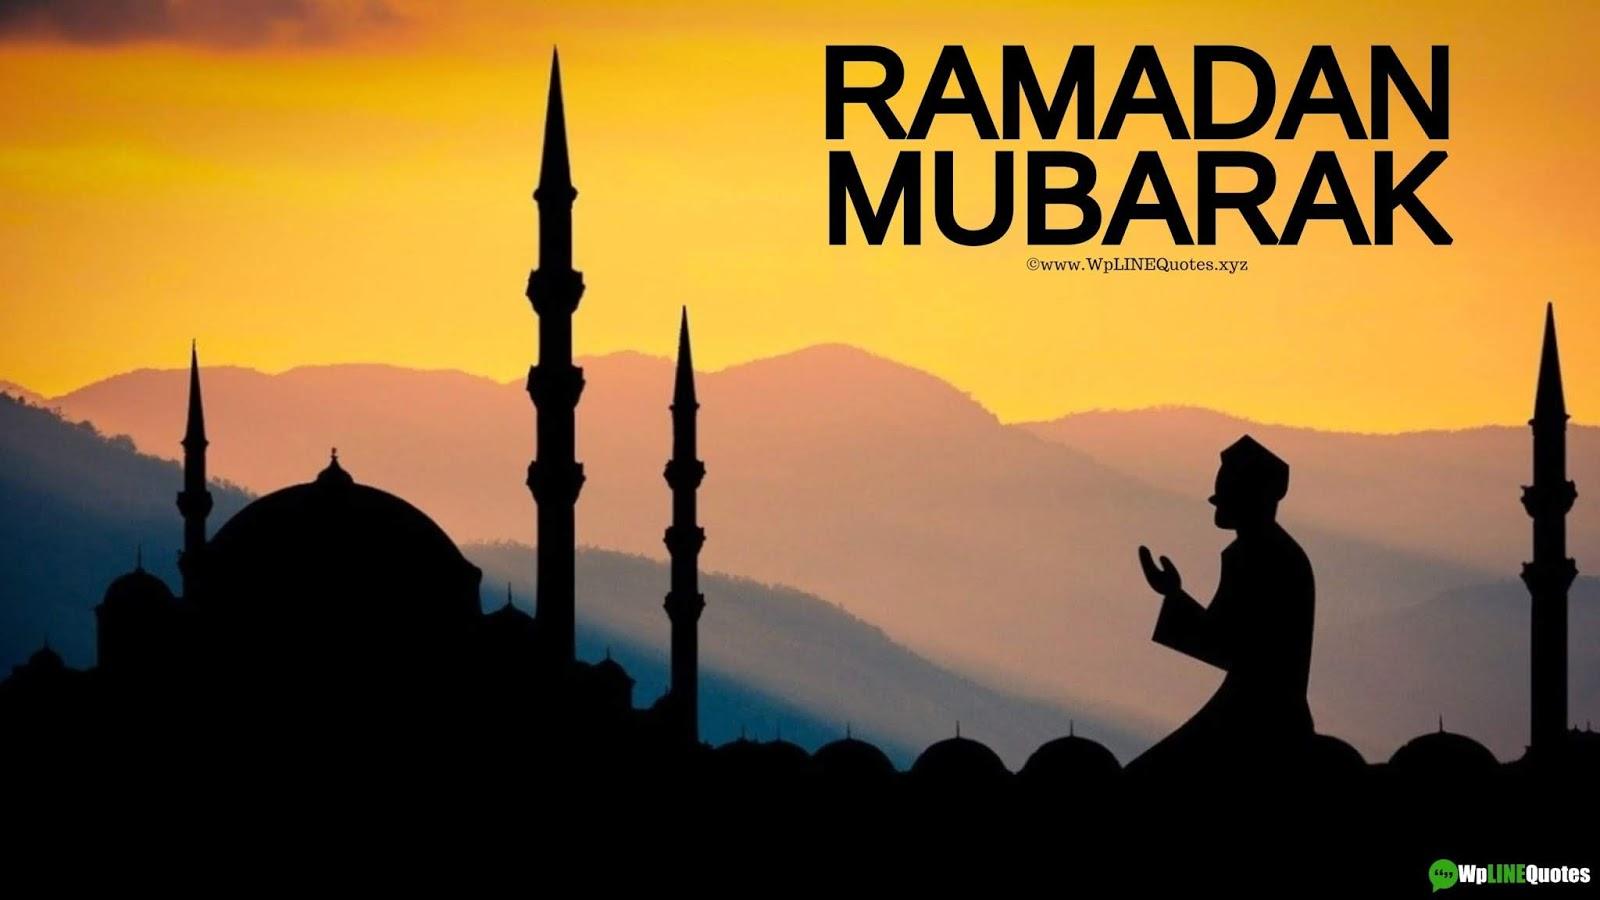 Ramadan Wishes Ramadan Mubarak Messages, Greetings, SMS, Images, Photos, Pictures, Wallpaper